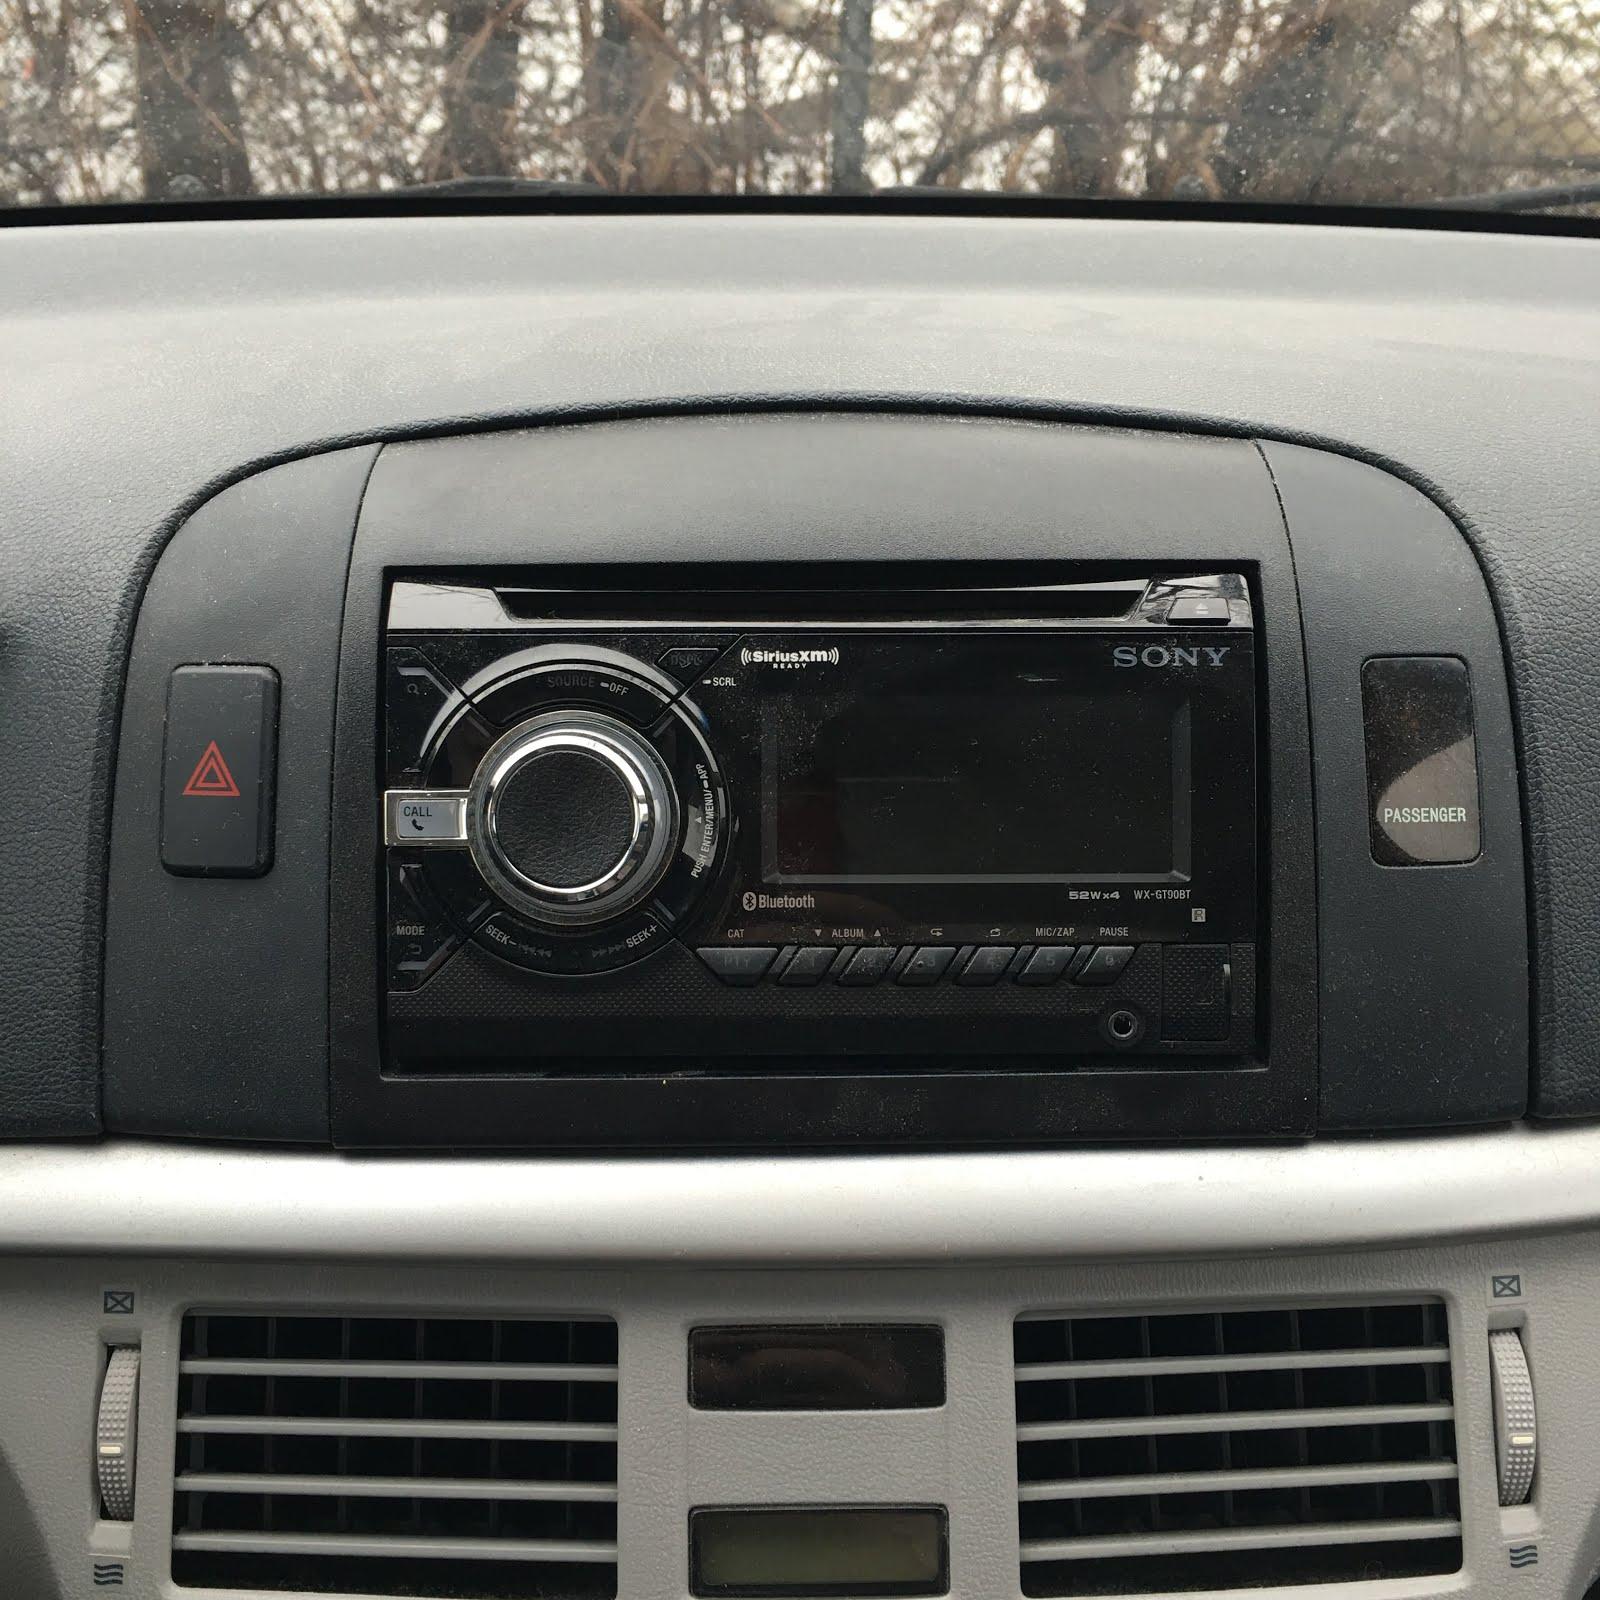 2016 Hyundai Sonata Speaker Wiring Diagram For Kenwood Cd Player 2007 Stereo